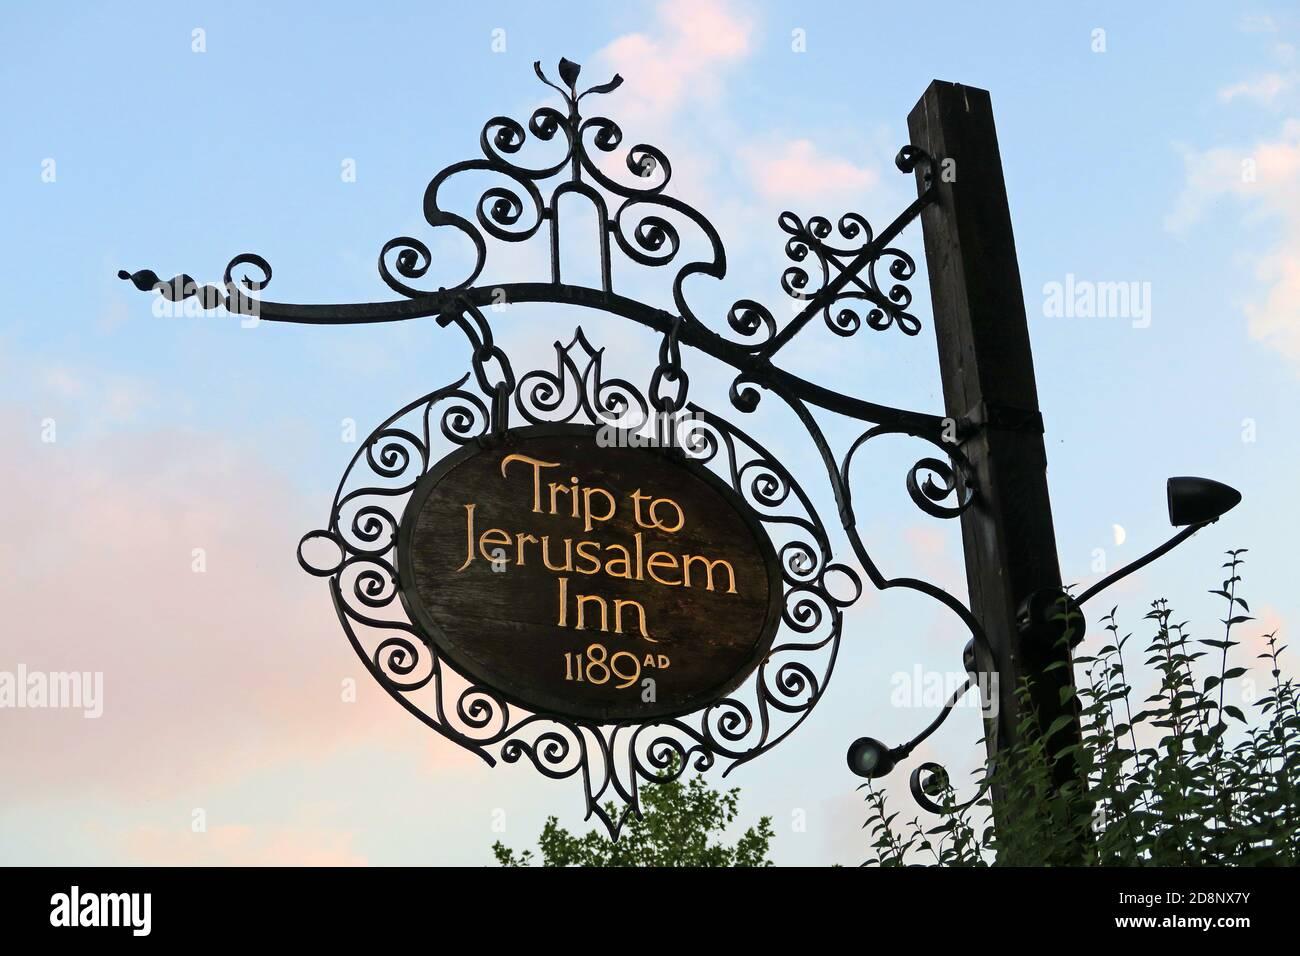 HotpixUK,@HotpixUK,GoTonySmith,UK,England,Great Britain,GB,Nottingham,pub,bar,CAMRA,listed building,oldest bar,old,historic,dusk,evening,sign,city centre,Nottingham city centre,Notts,Nottinghamshire,NG1,east Midlands,Oldest Inn In England,medieval,historic building,1189,Castle Rock,Nottingham Castle,brewhouse,1799,The Pilgrim,the Trip,Brew House Yard,Nottingham Castle Brewhouse,pub sign